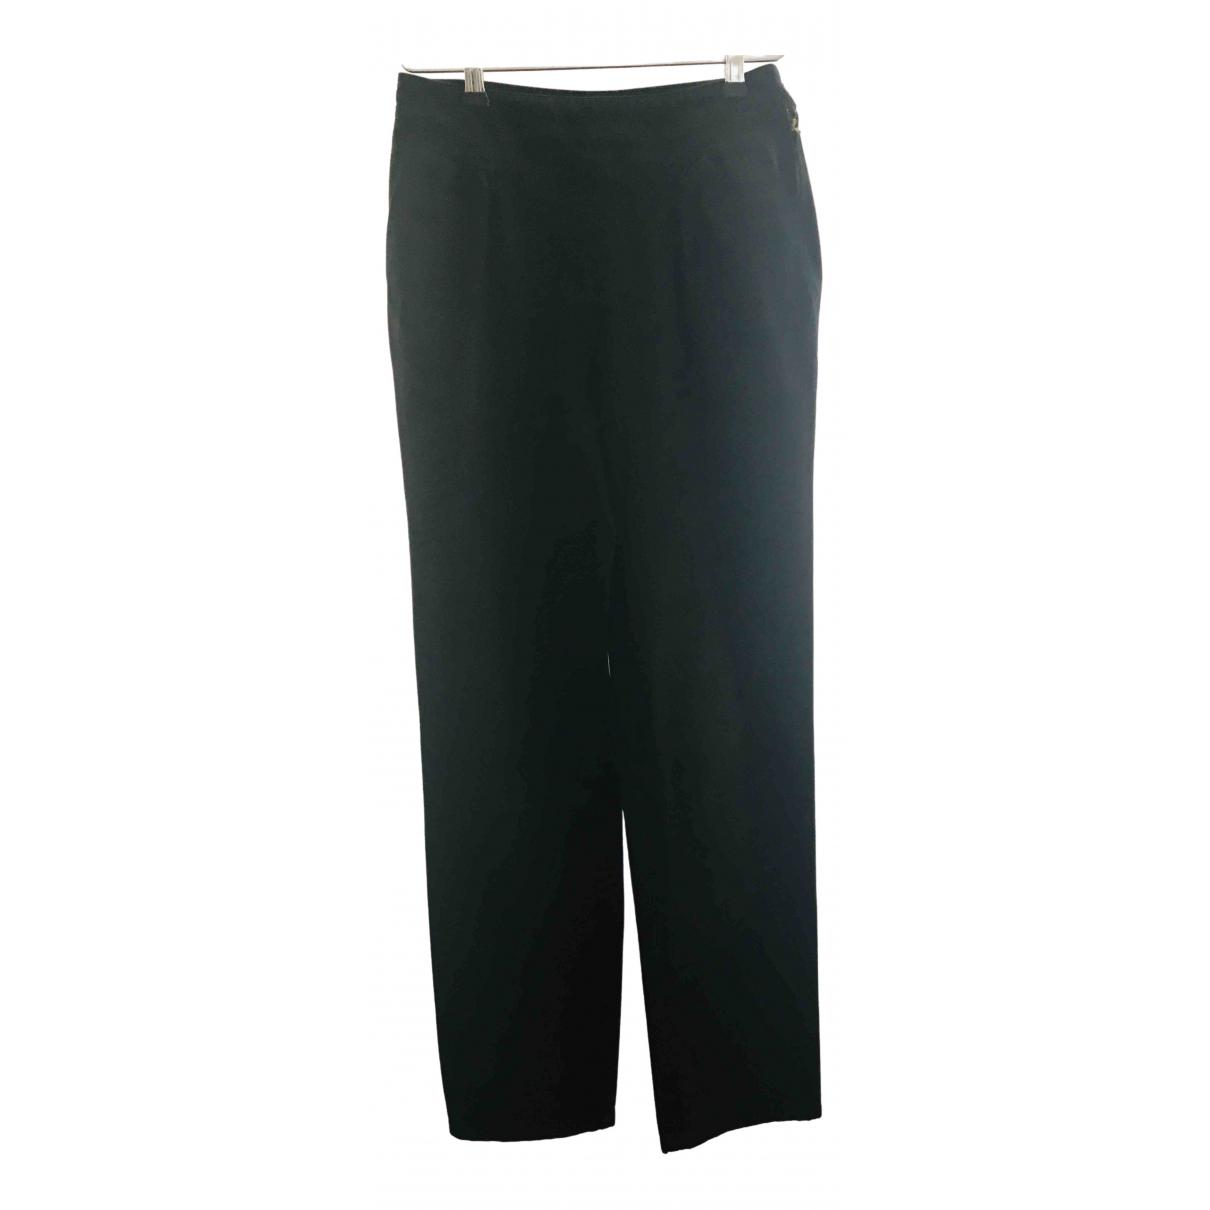 Bernhard Willhelm \N Black Cotton Trousers for Women 38 FR